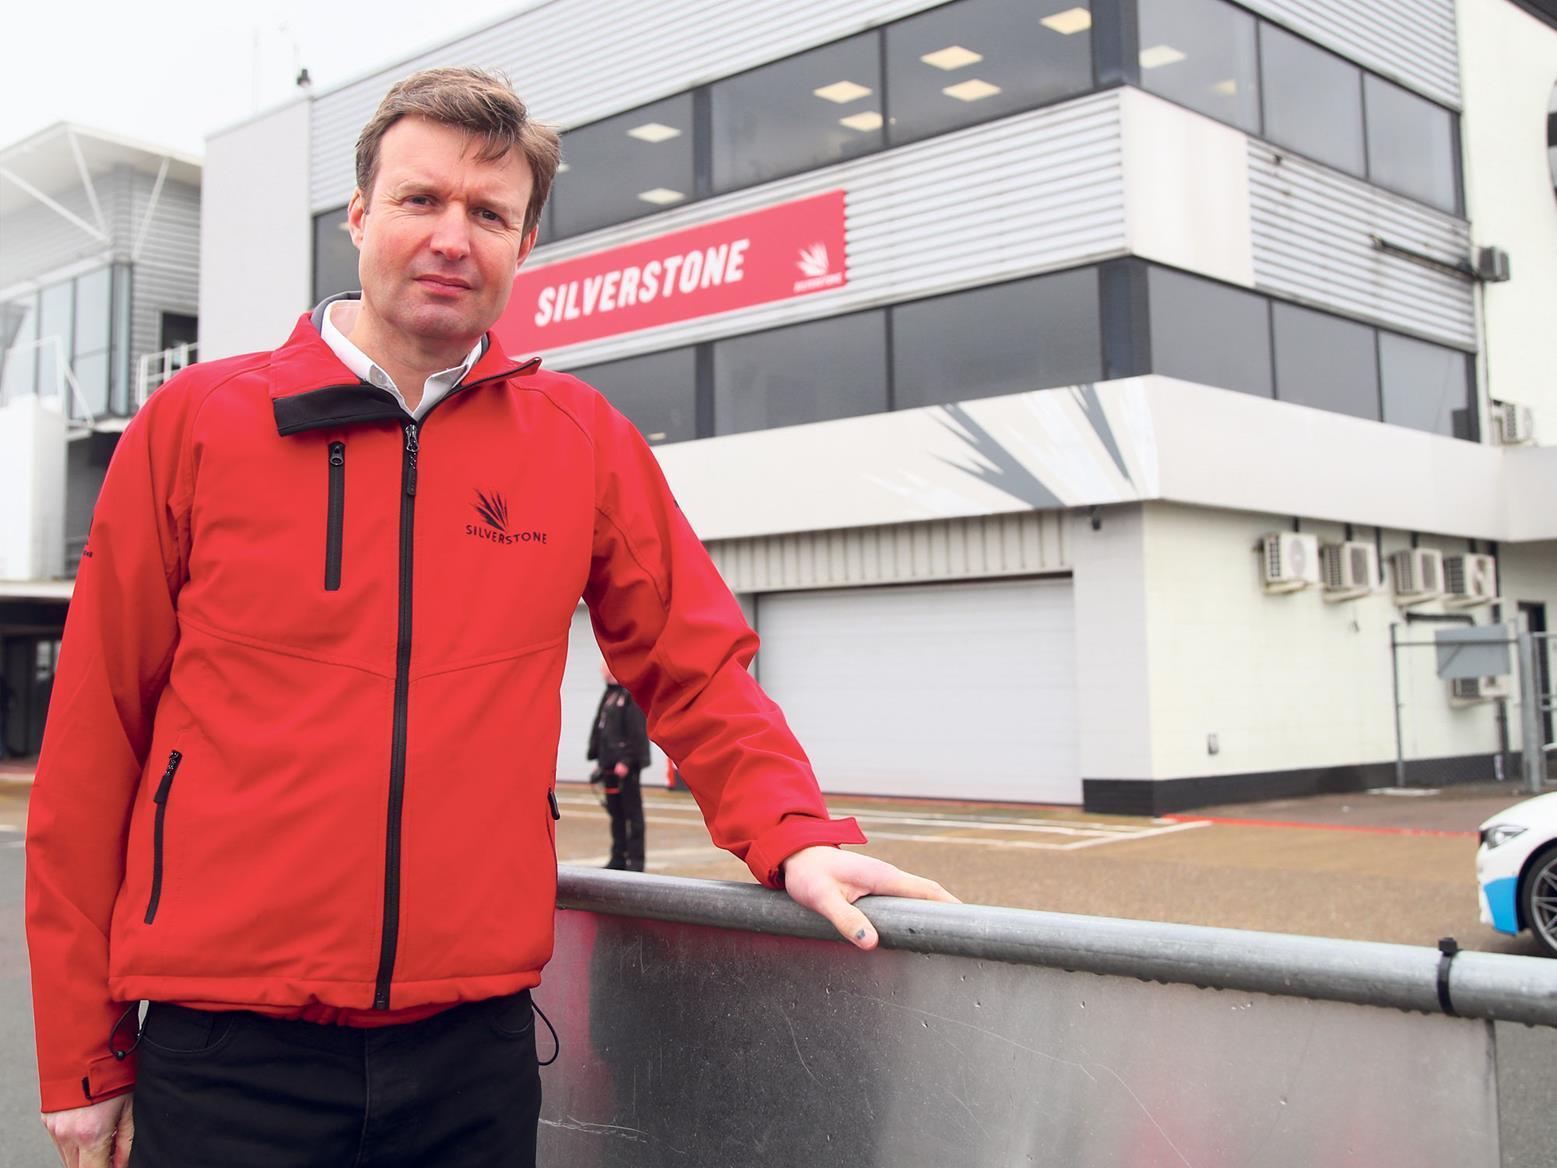 Silverstone Managing Director, Stuart Pringle